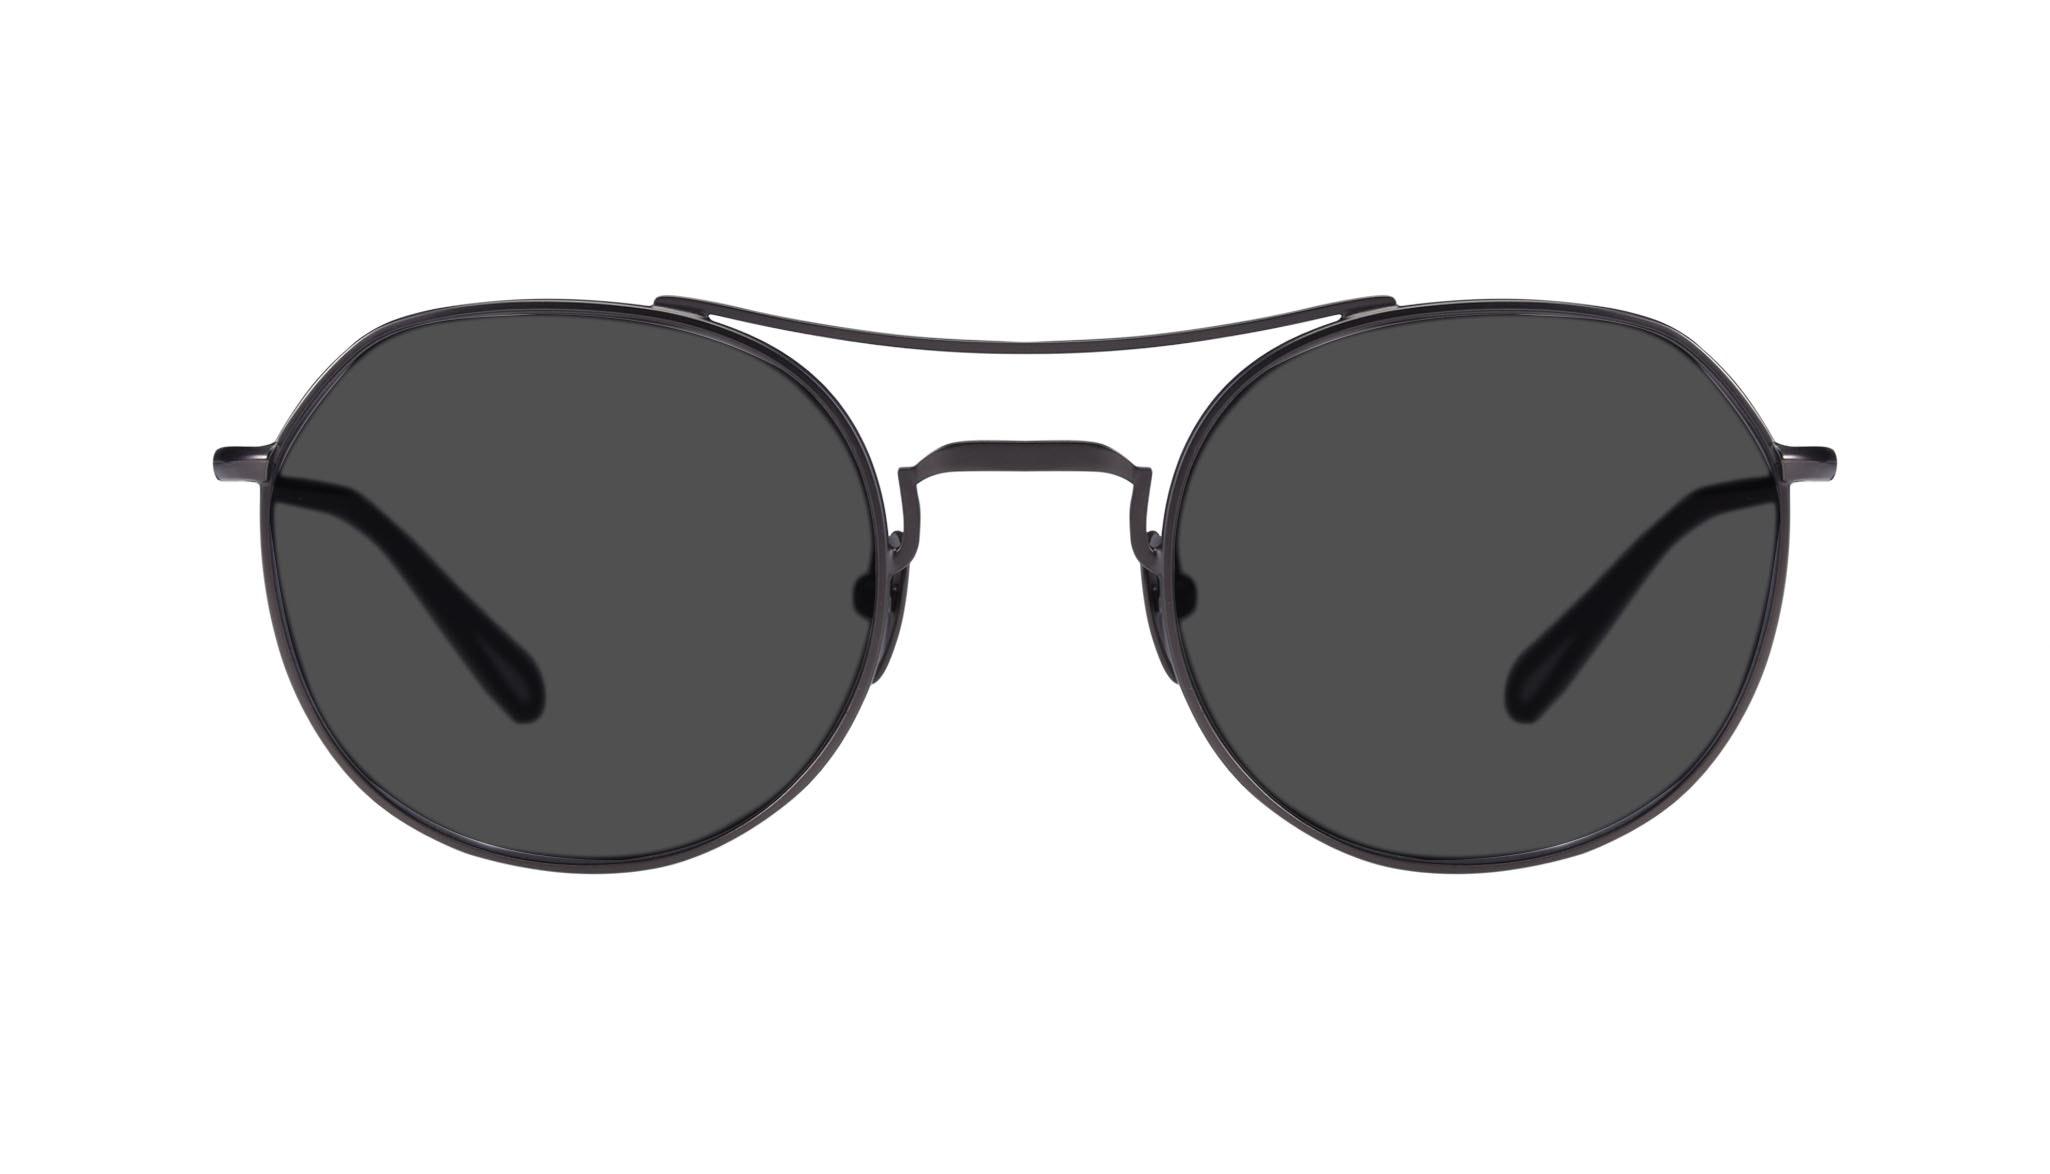 Affordable Fashion Glasses Aviator Sunglasses Men Force Gun Metal Front